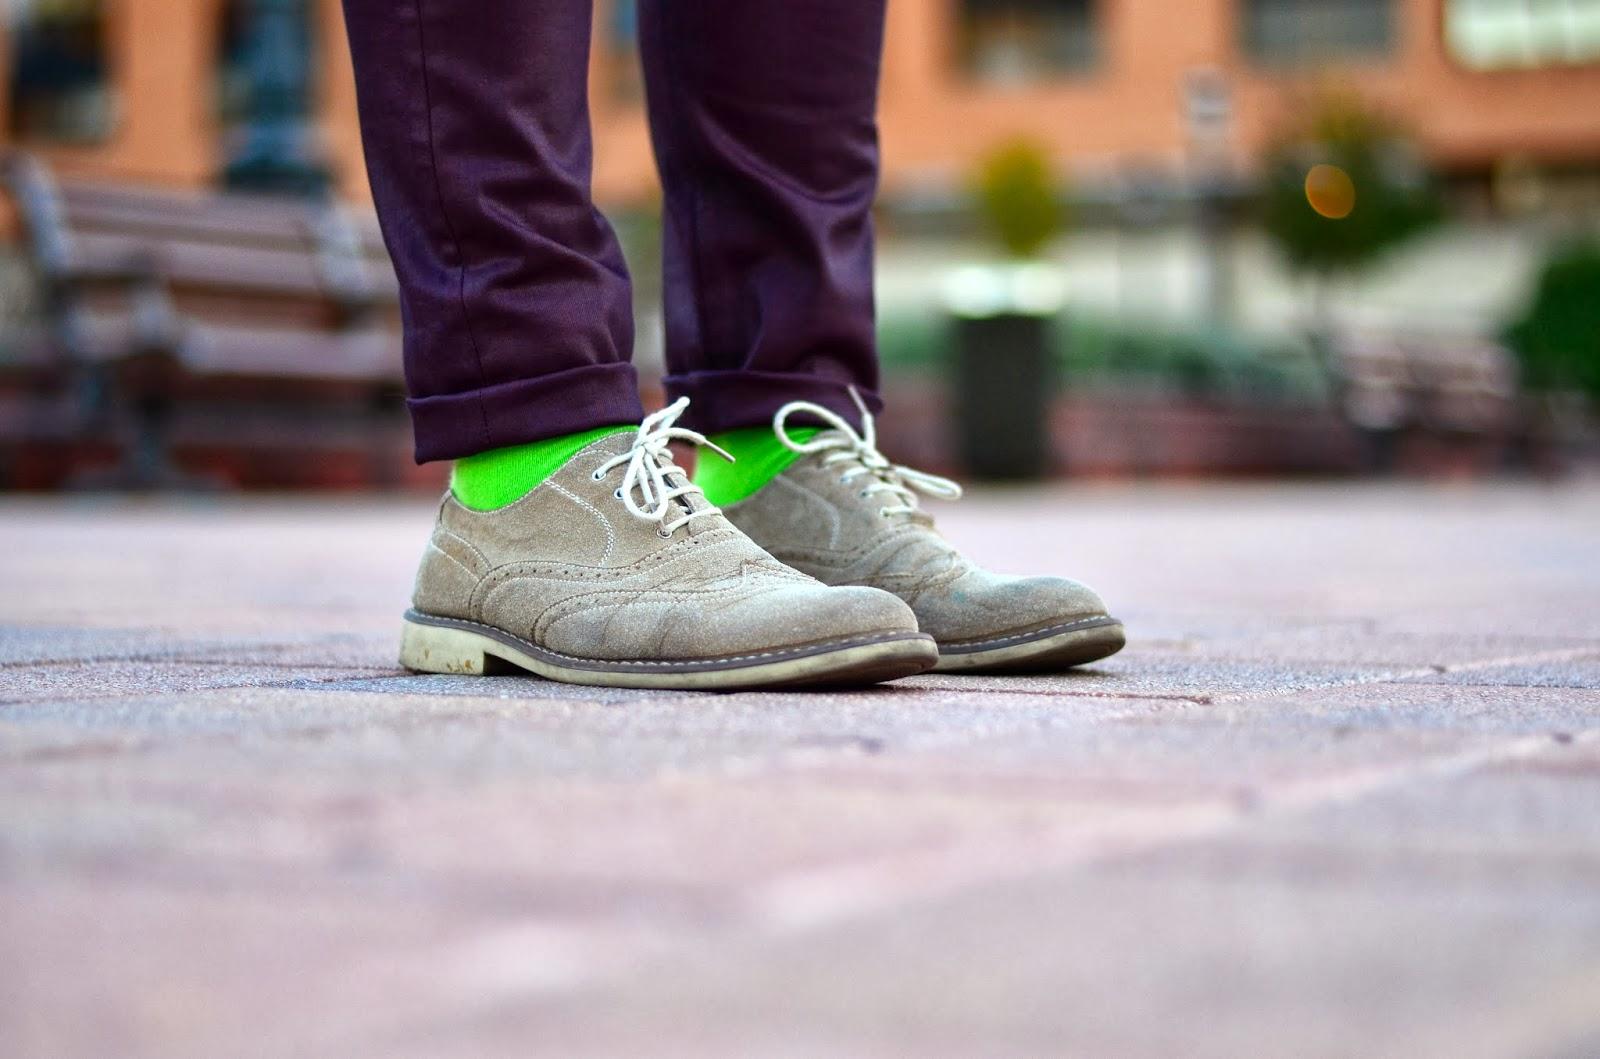 foto calcetines verdes menta